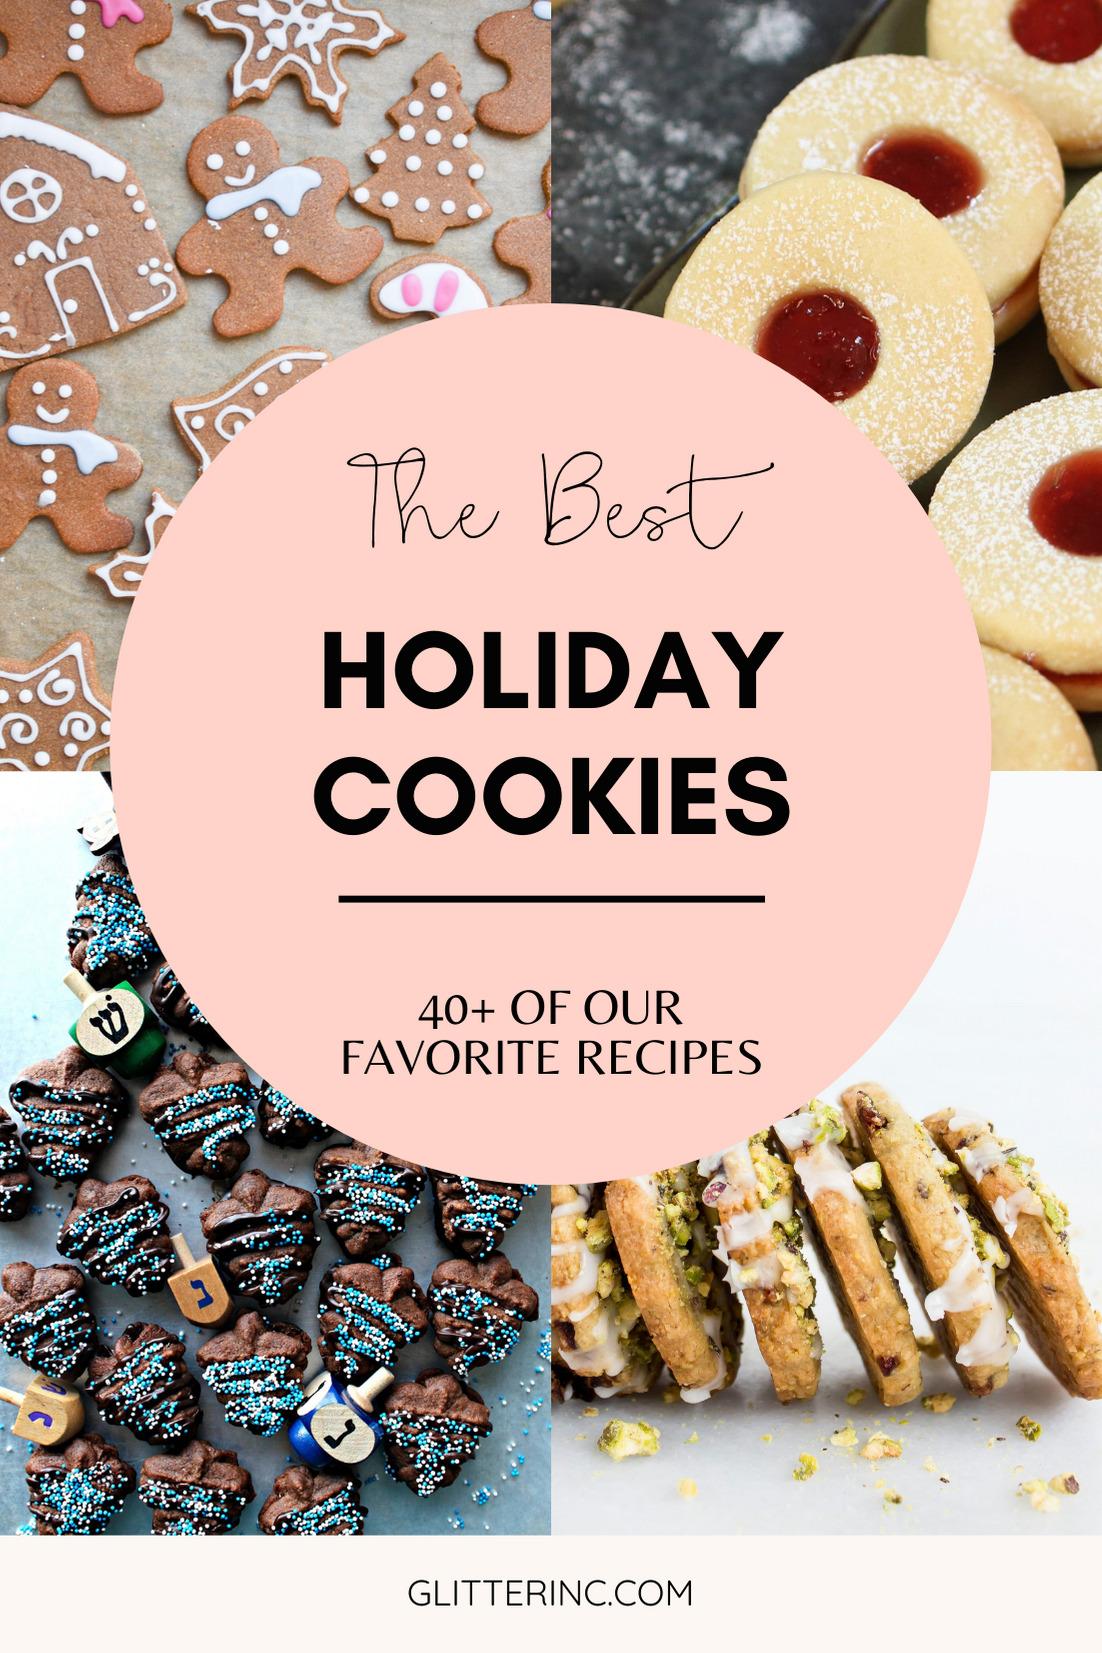 The Ultimate Christmas Cookie Exchange Recipe Roundup | @glitterinclexi | GLITTERINC.COM